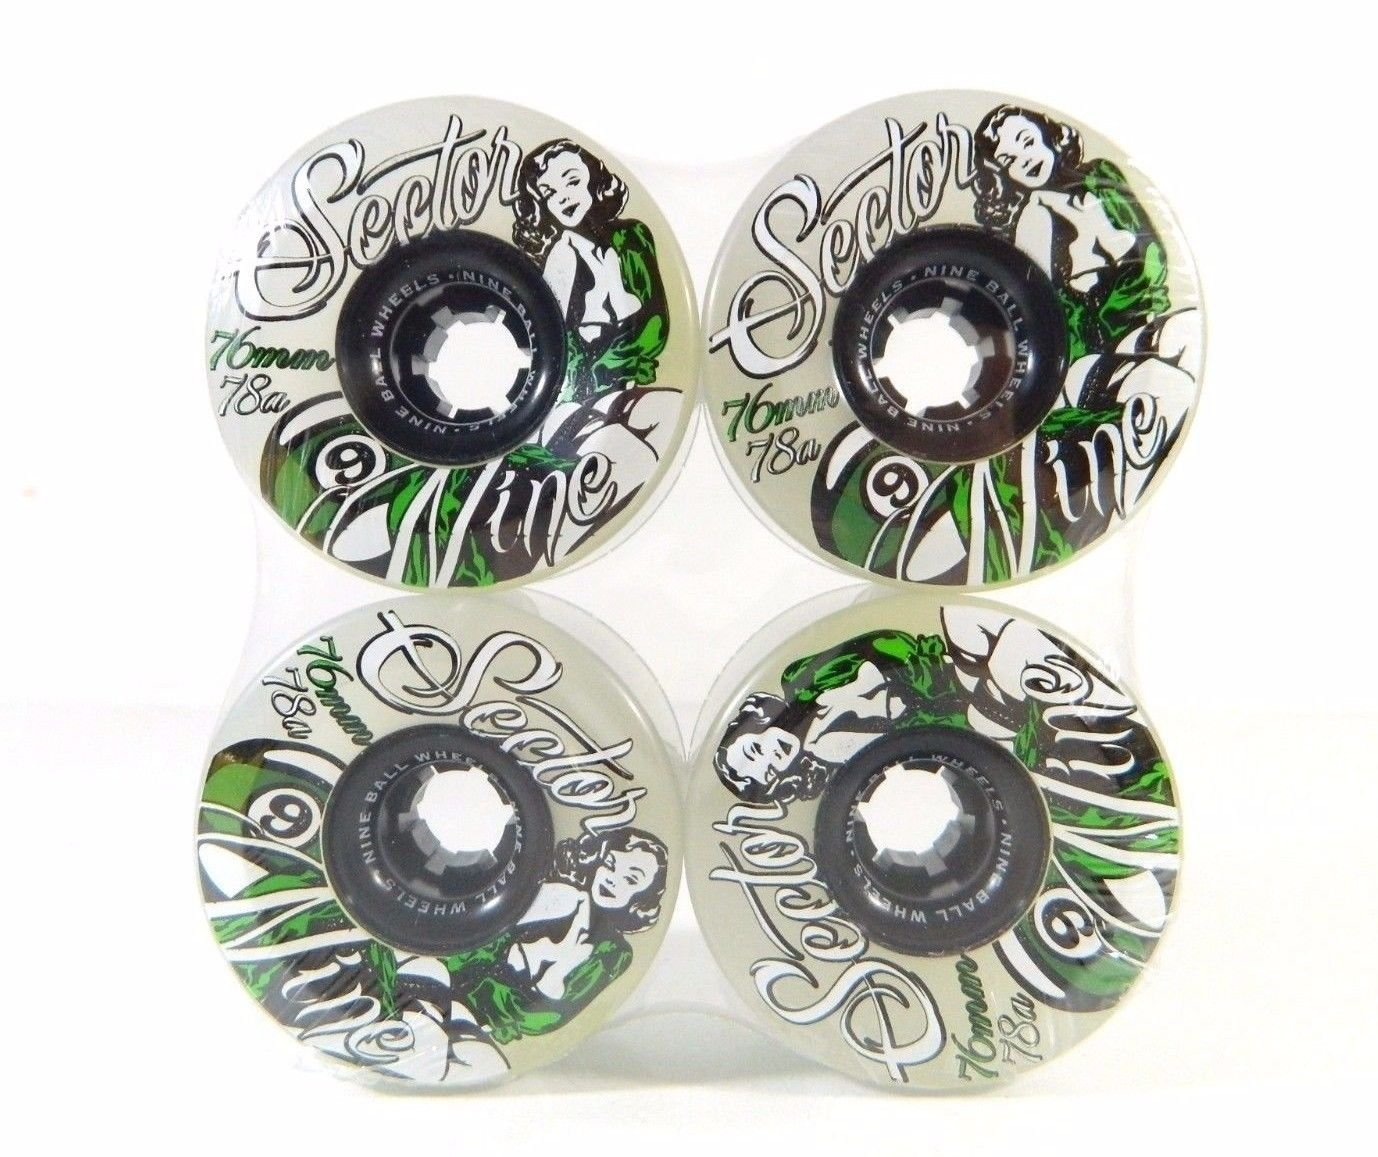 Sector 9 Goddess of Speed 76Mm 78A Longboard Wheels Ghost/Green